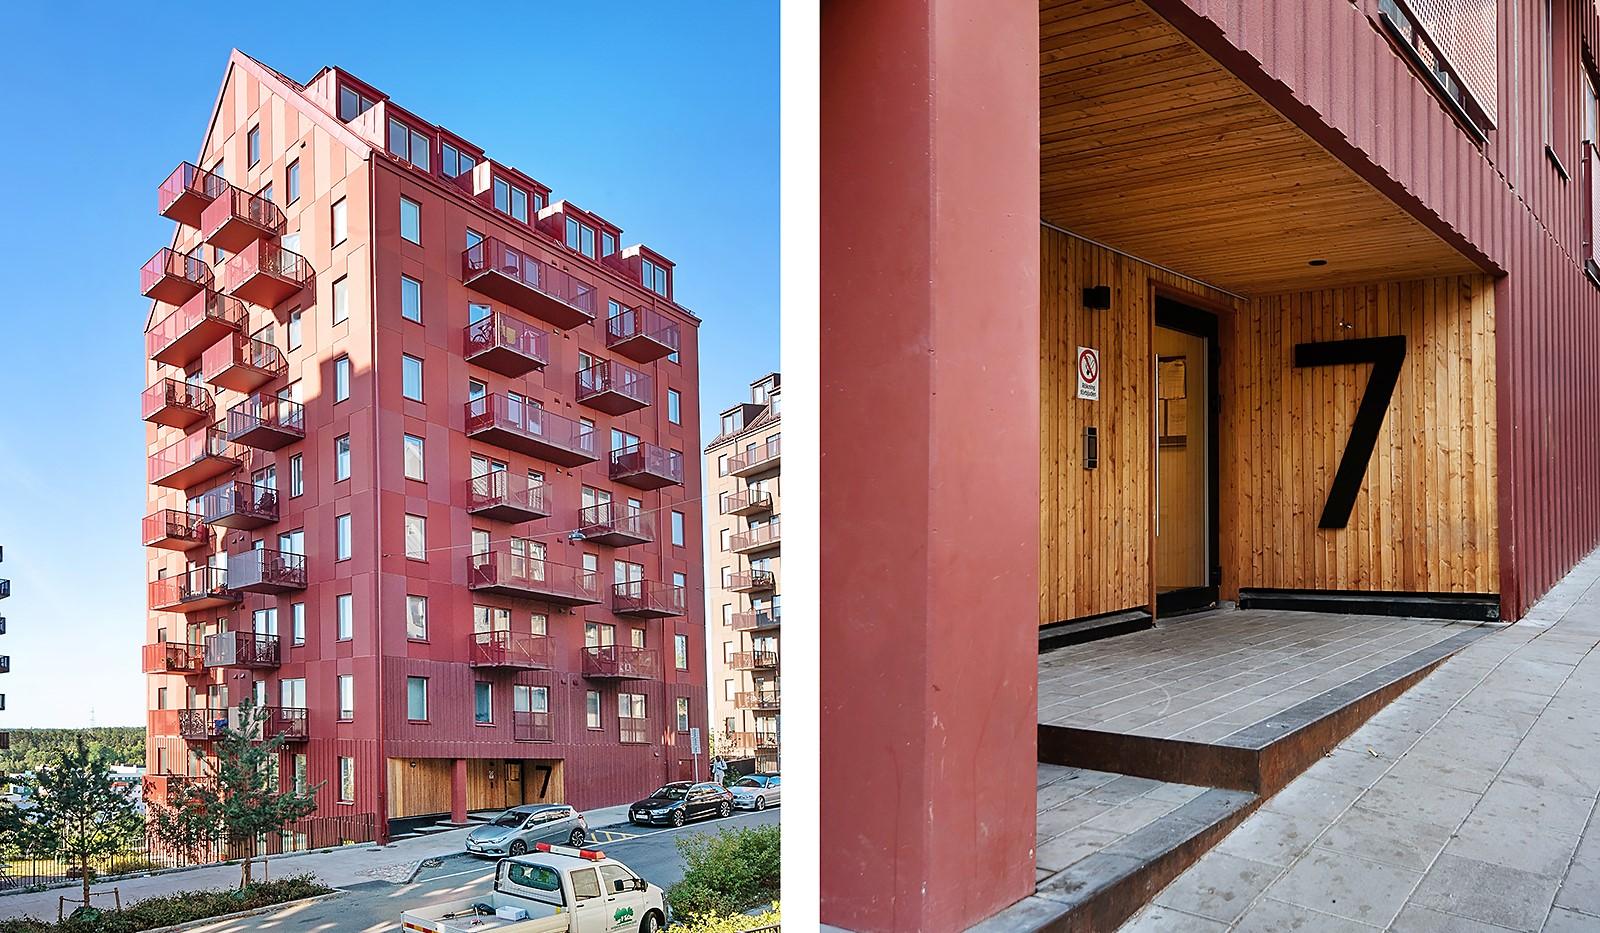 Lagmansbacken 7, 7tr - Fasad och entrén